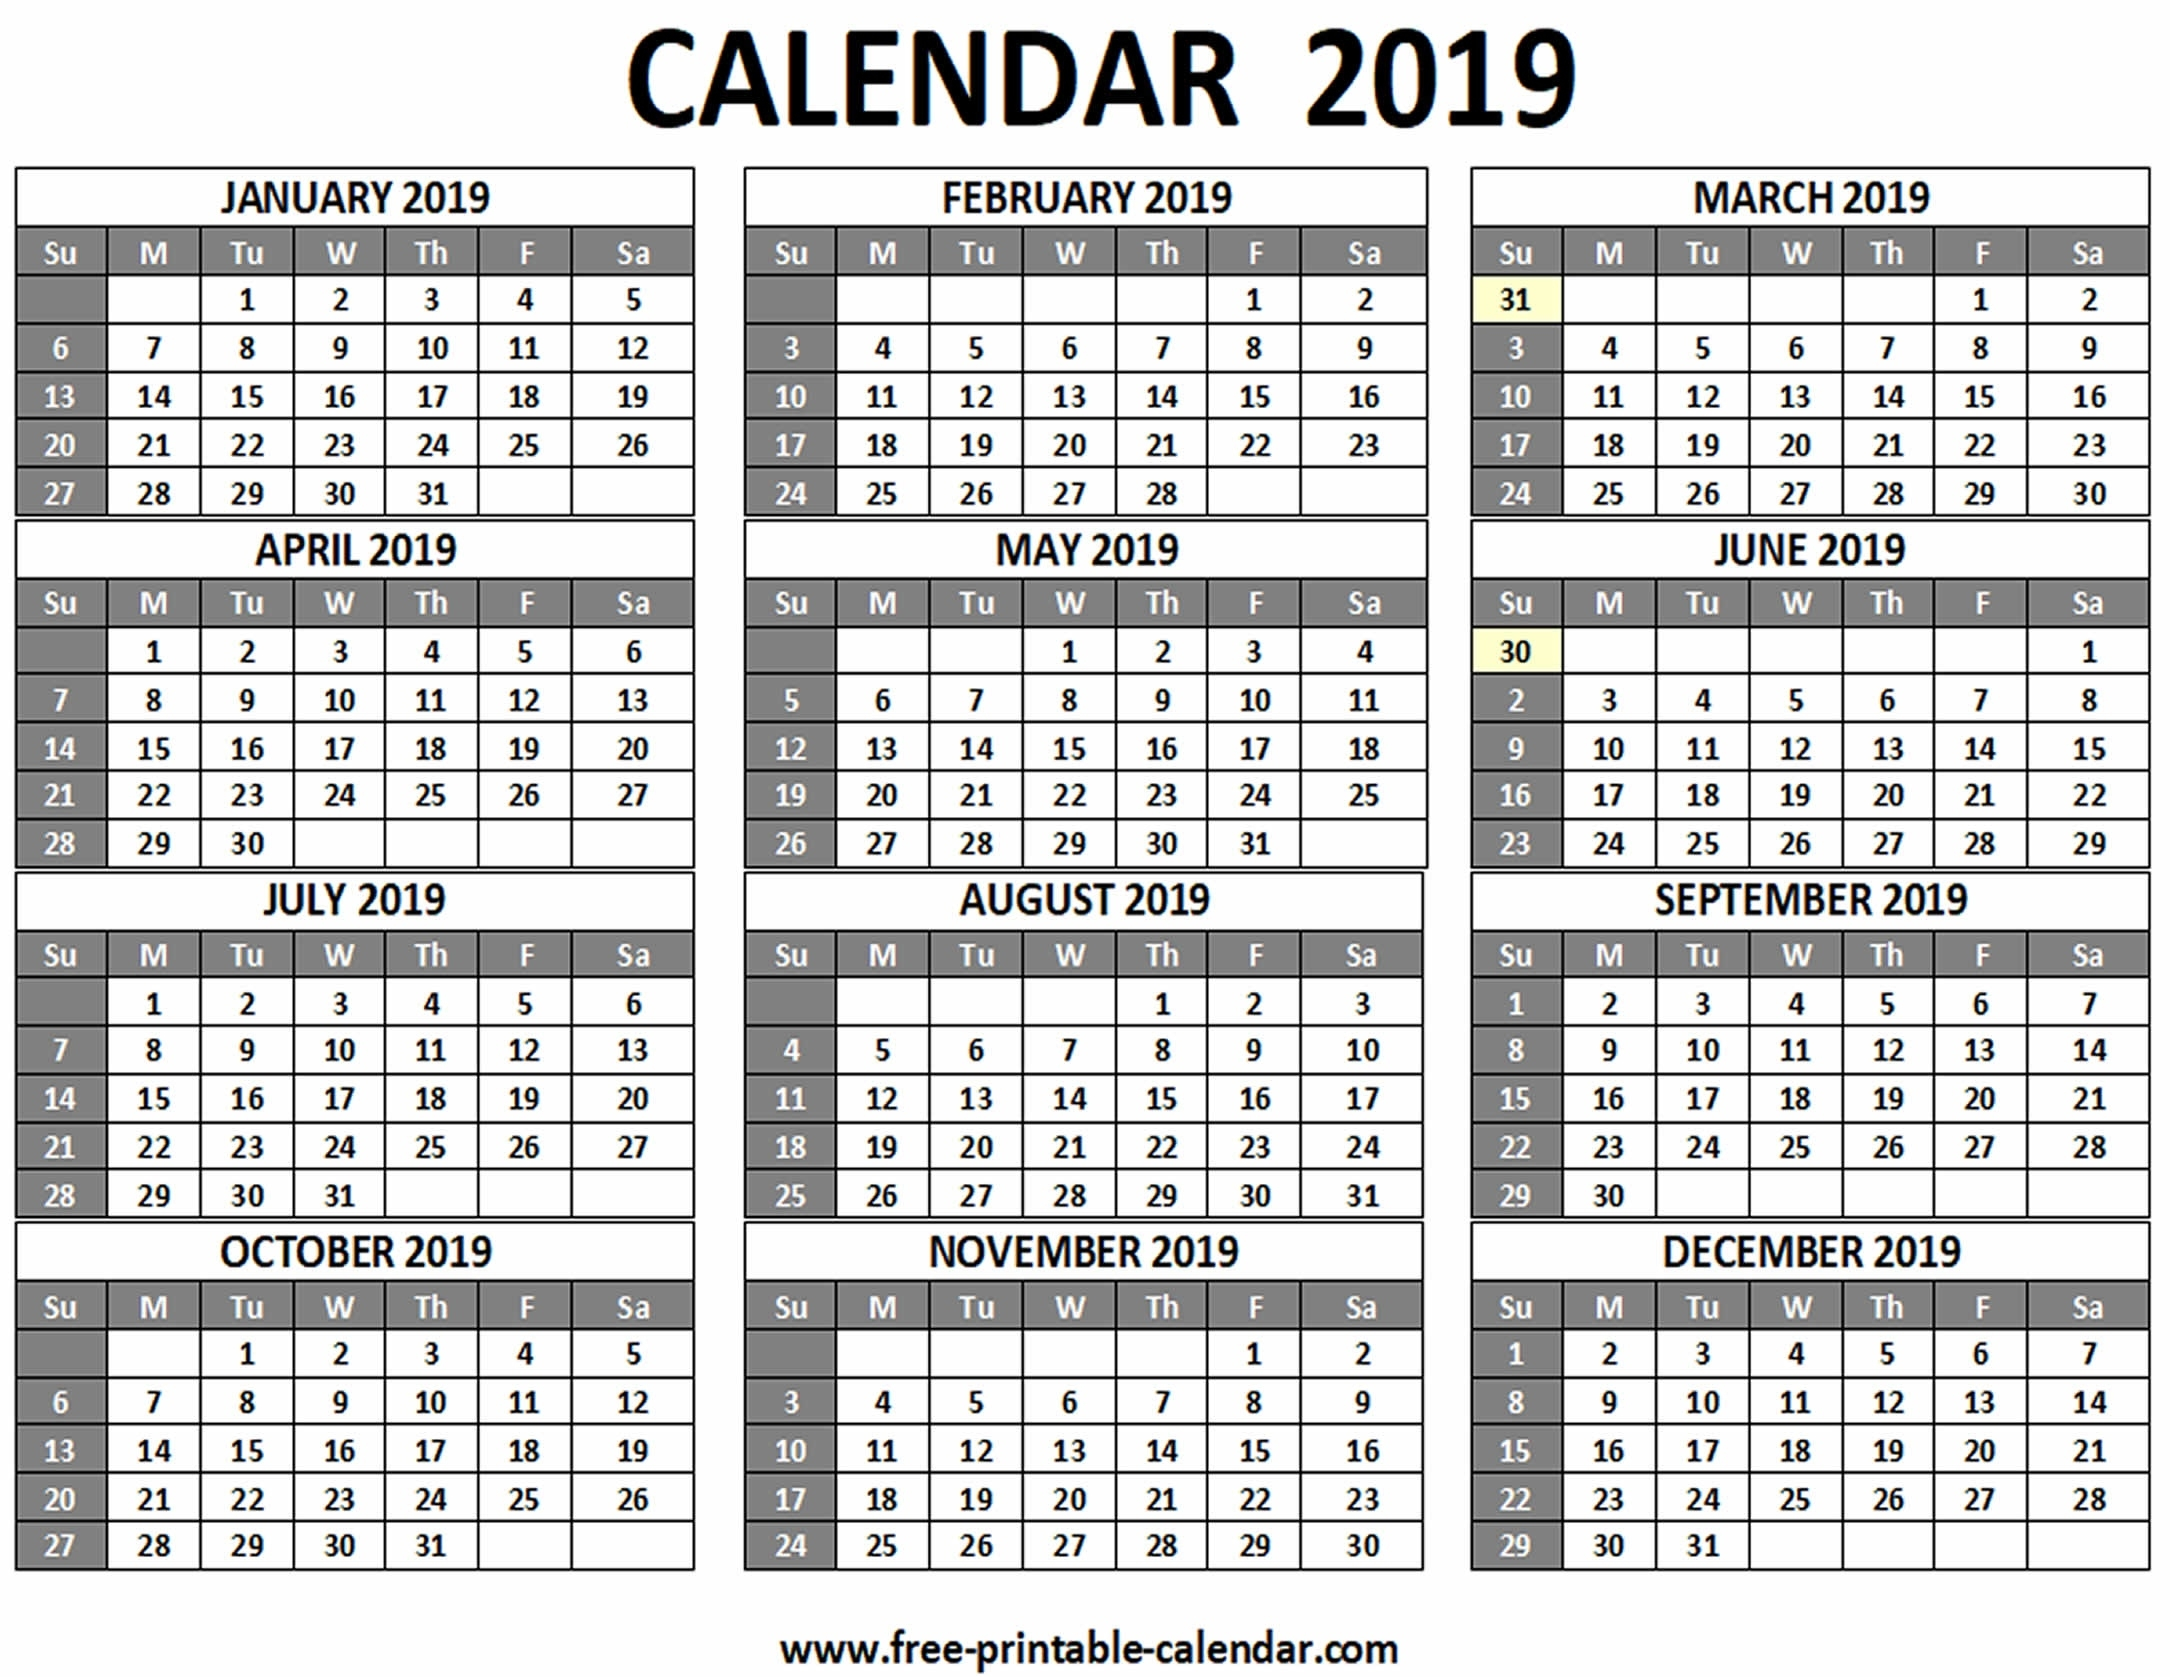 Printable 2019 Calendar - Free-Printable-Calendar 6 M Onth Calendar On One Page